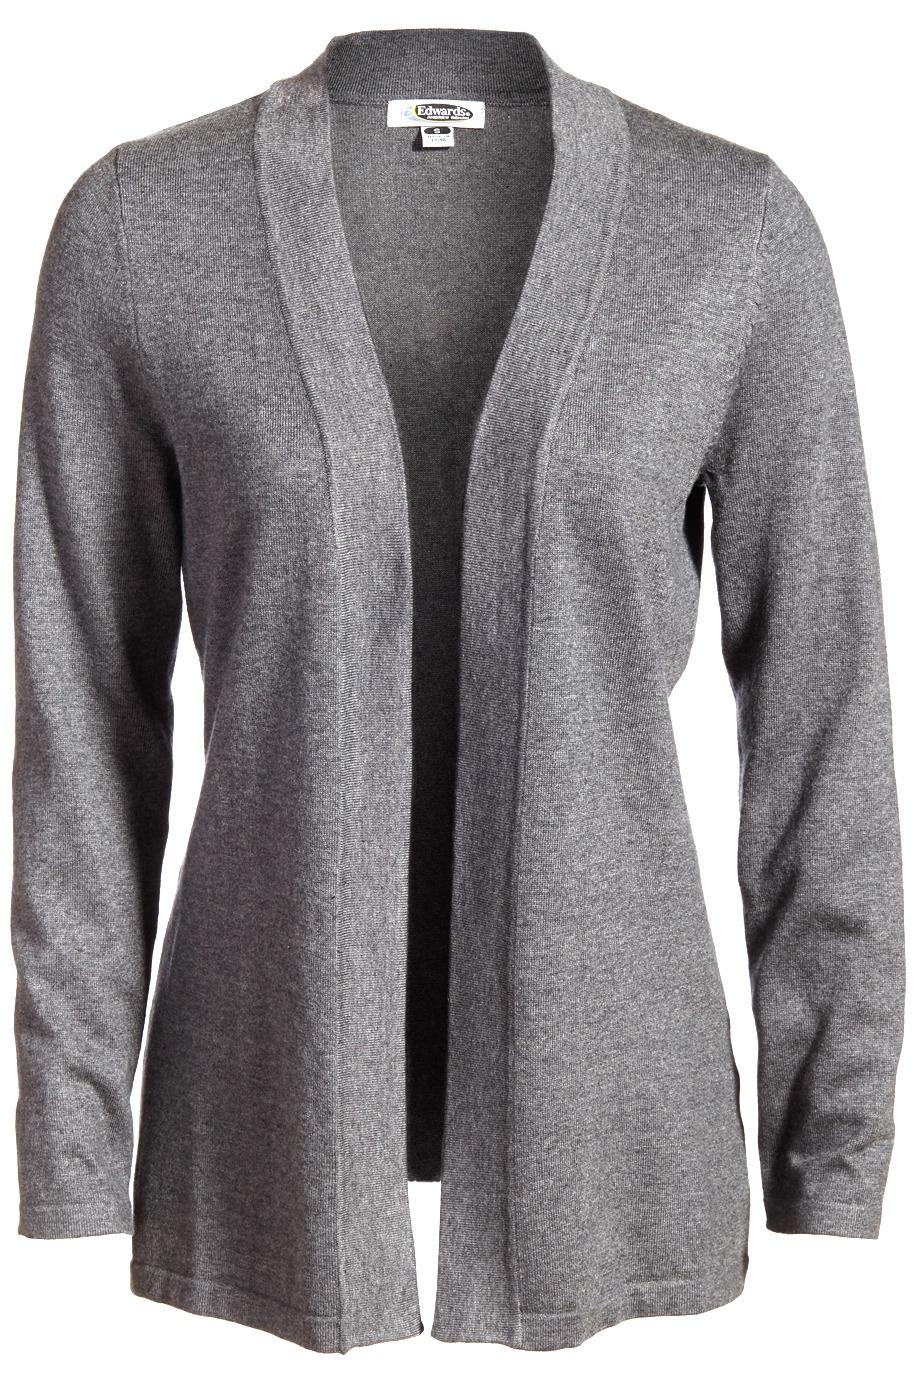 b28542cee7 Edwards Garment 7056 - Women s Open Front Cardigan  31.92 - Sweater